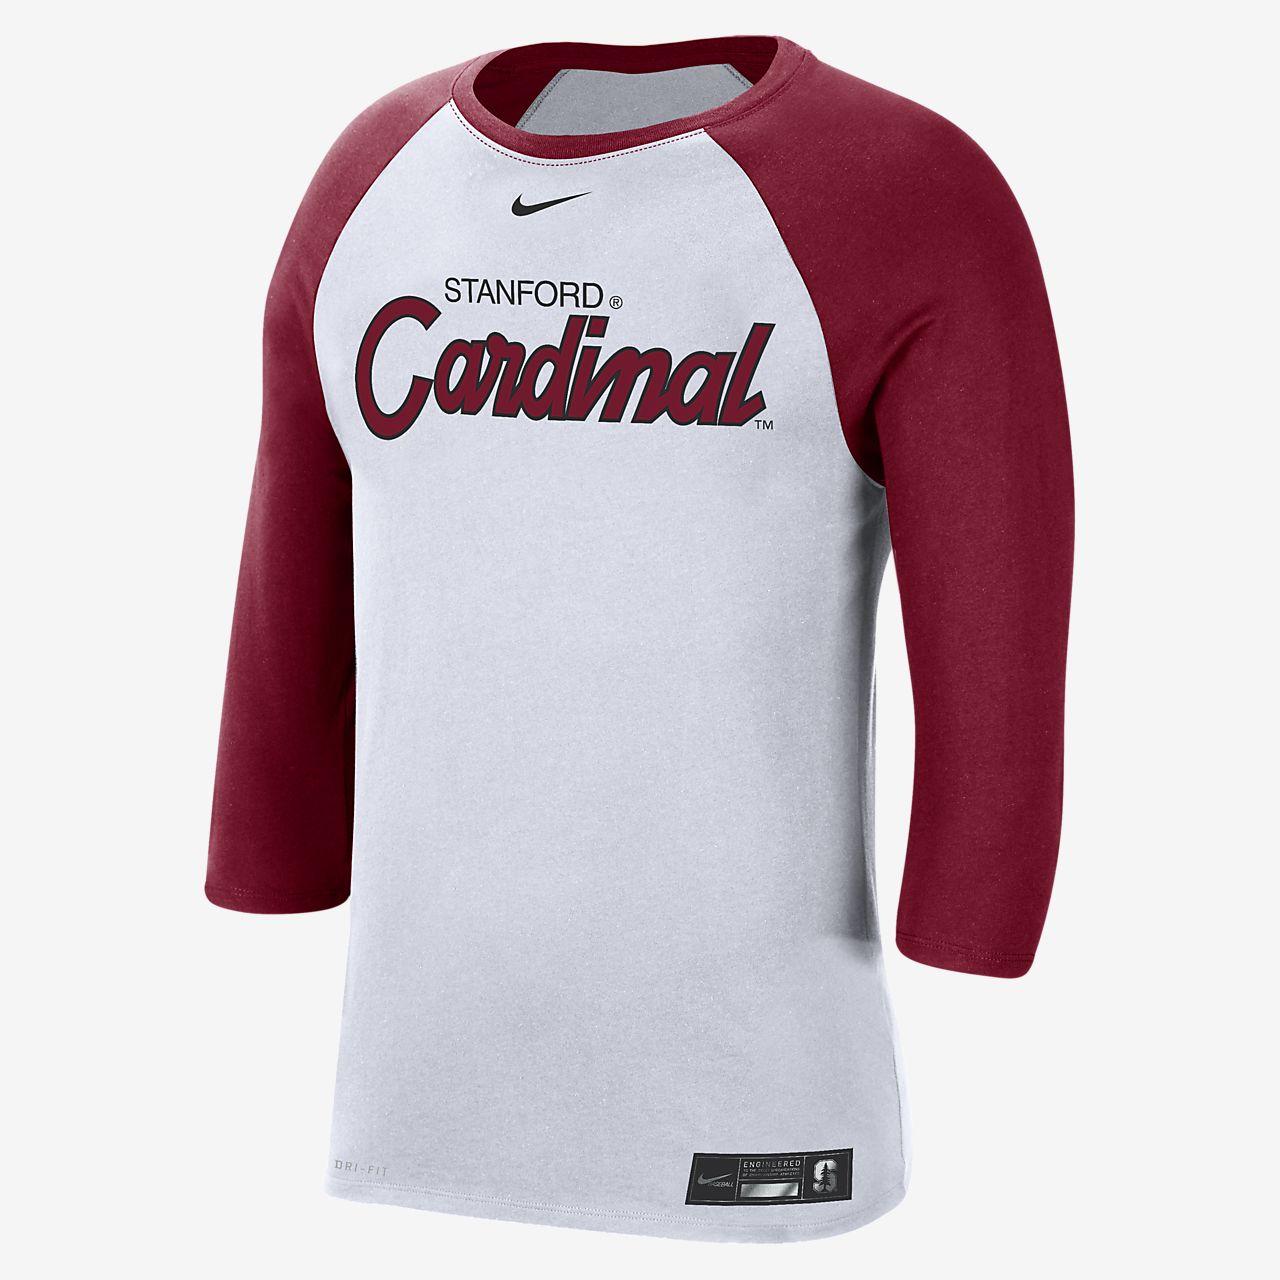 Nike College Dri-FIT (Stanford) Men's 3/4-Sleeve T-Shirt